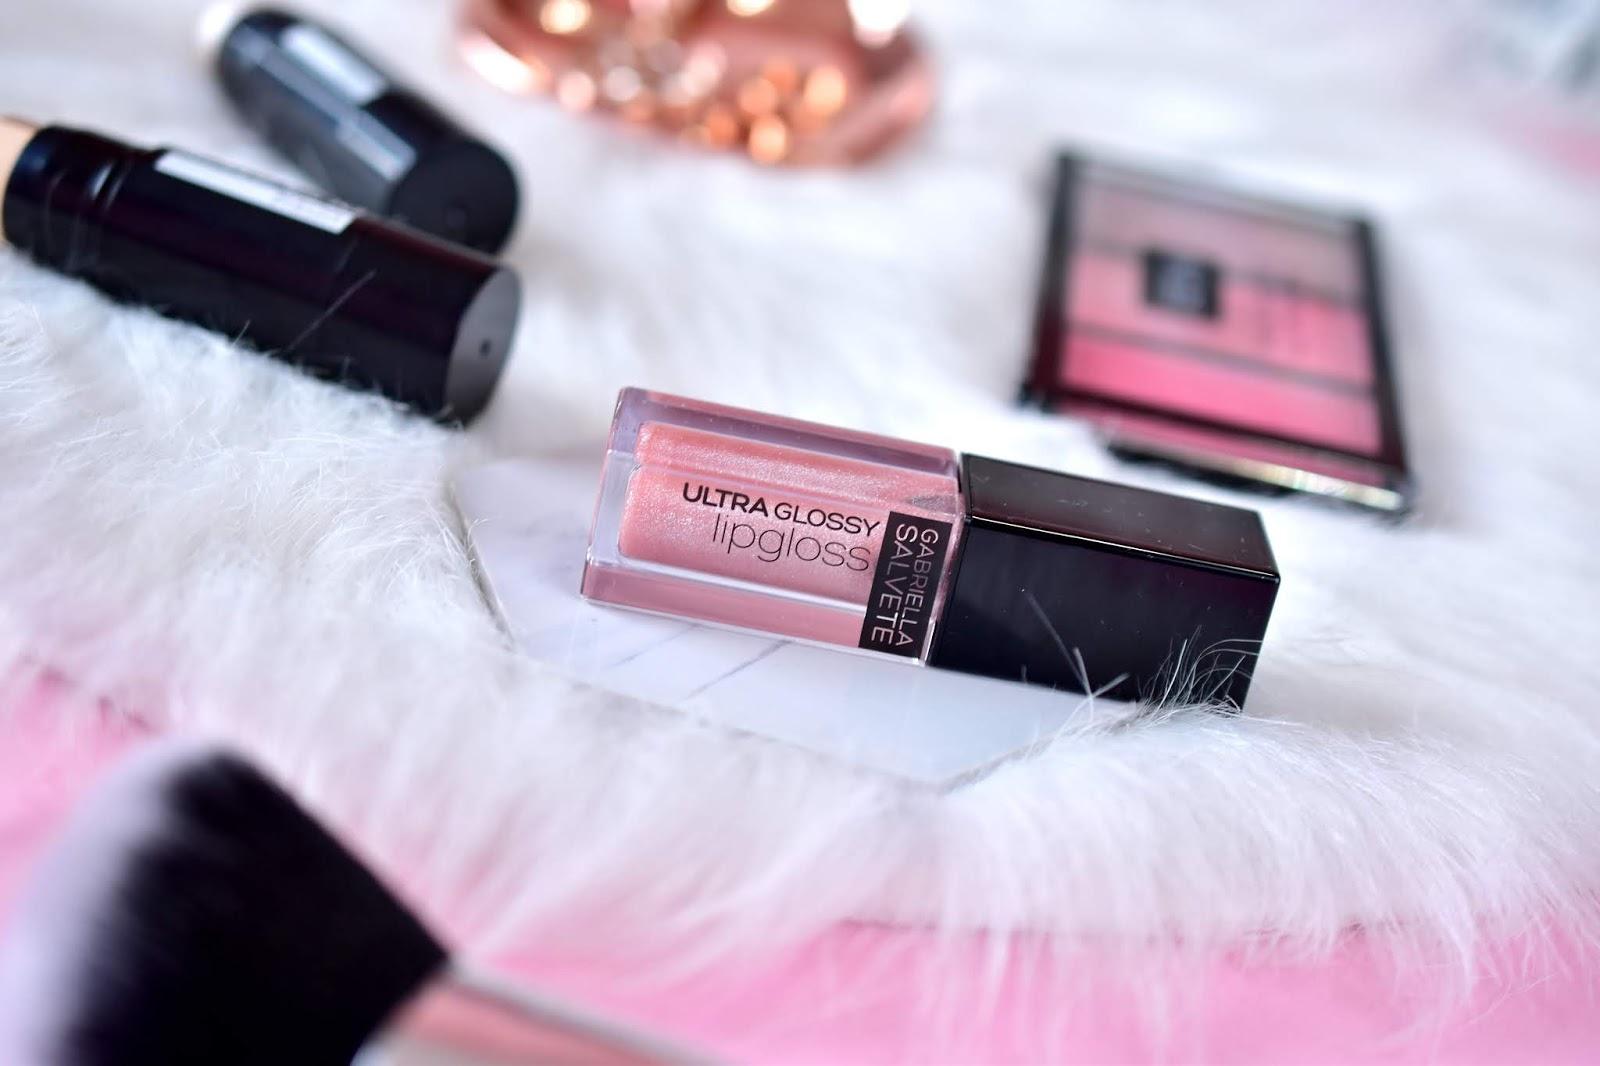 gabriella salvete ultra gossy lipgloss